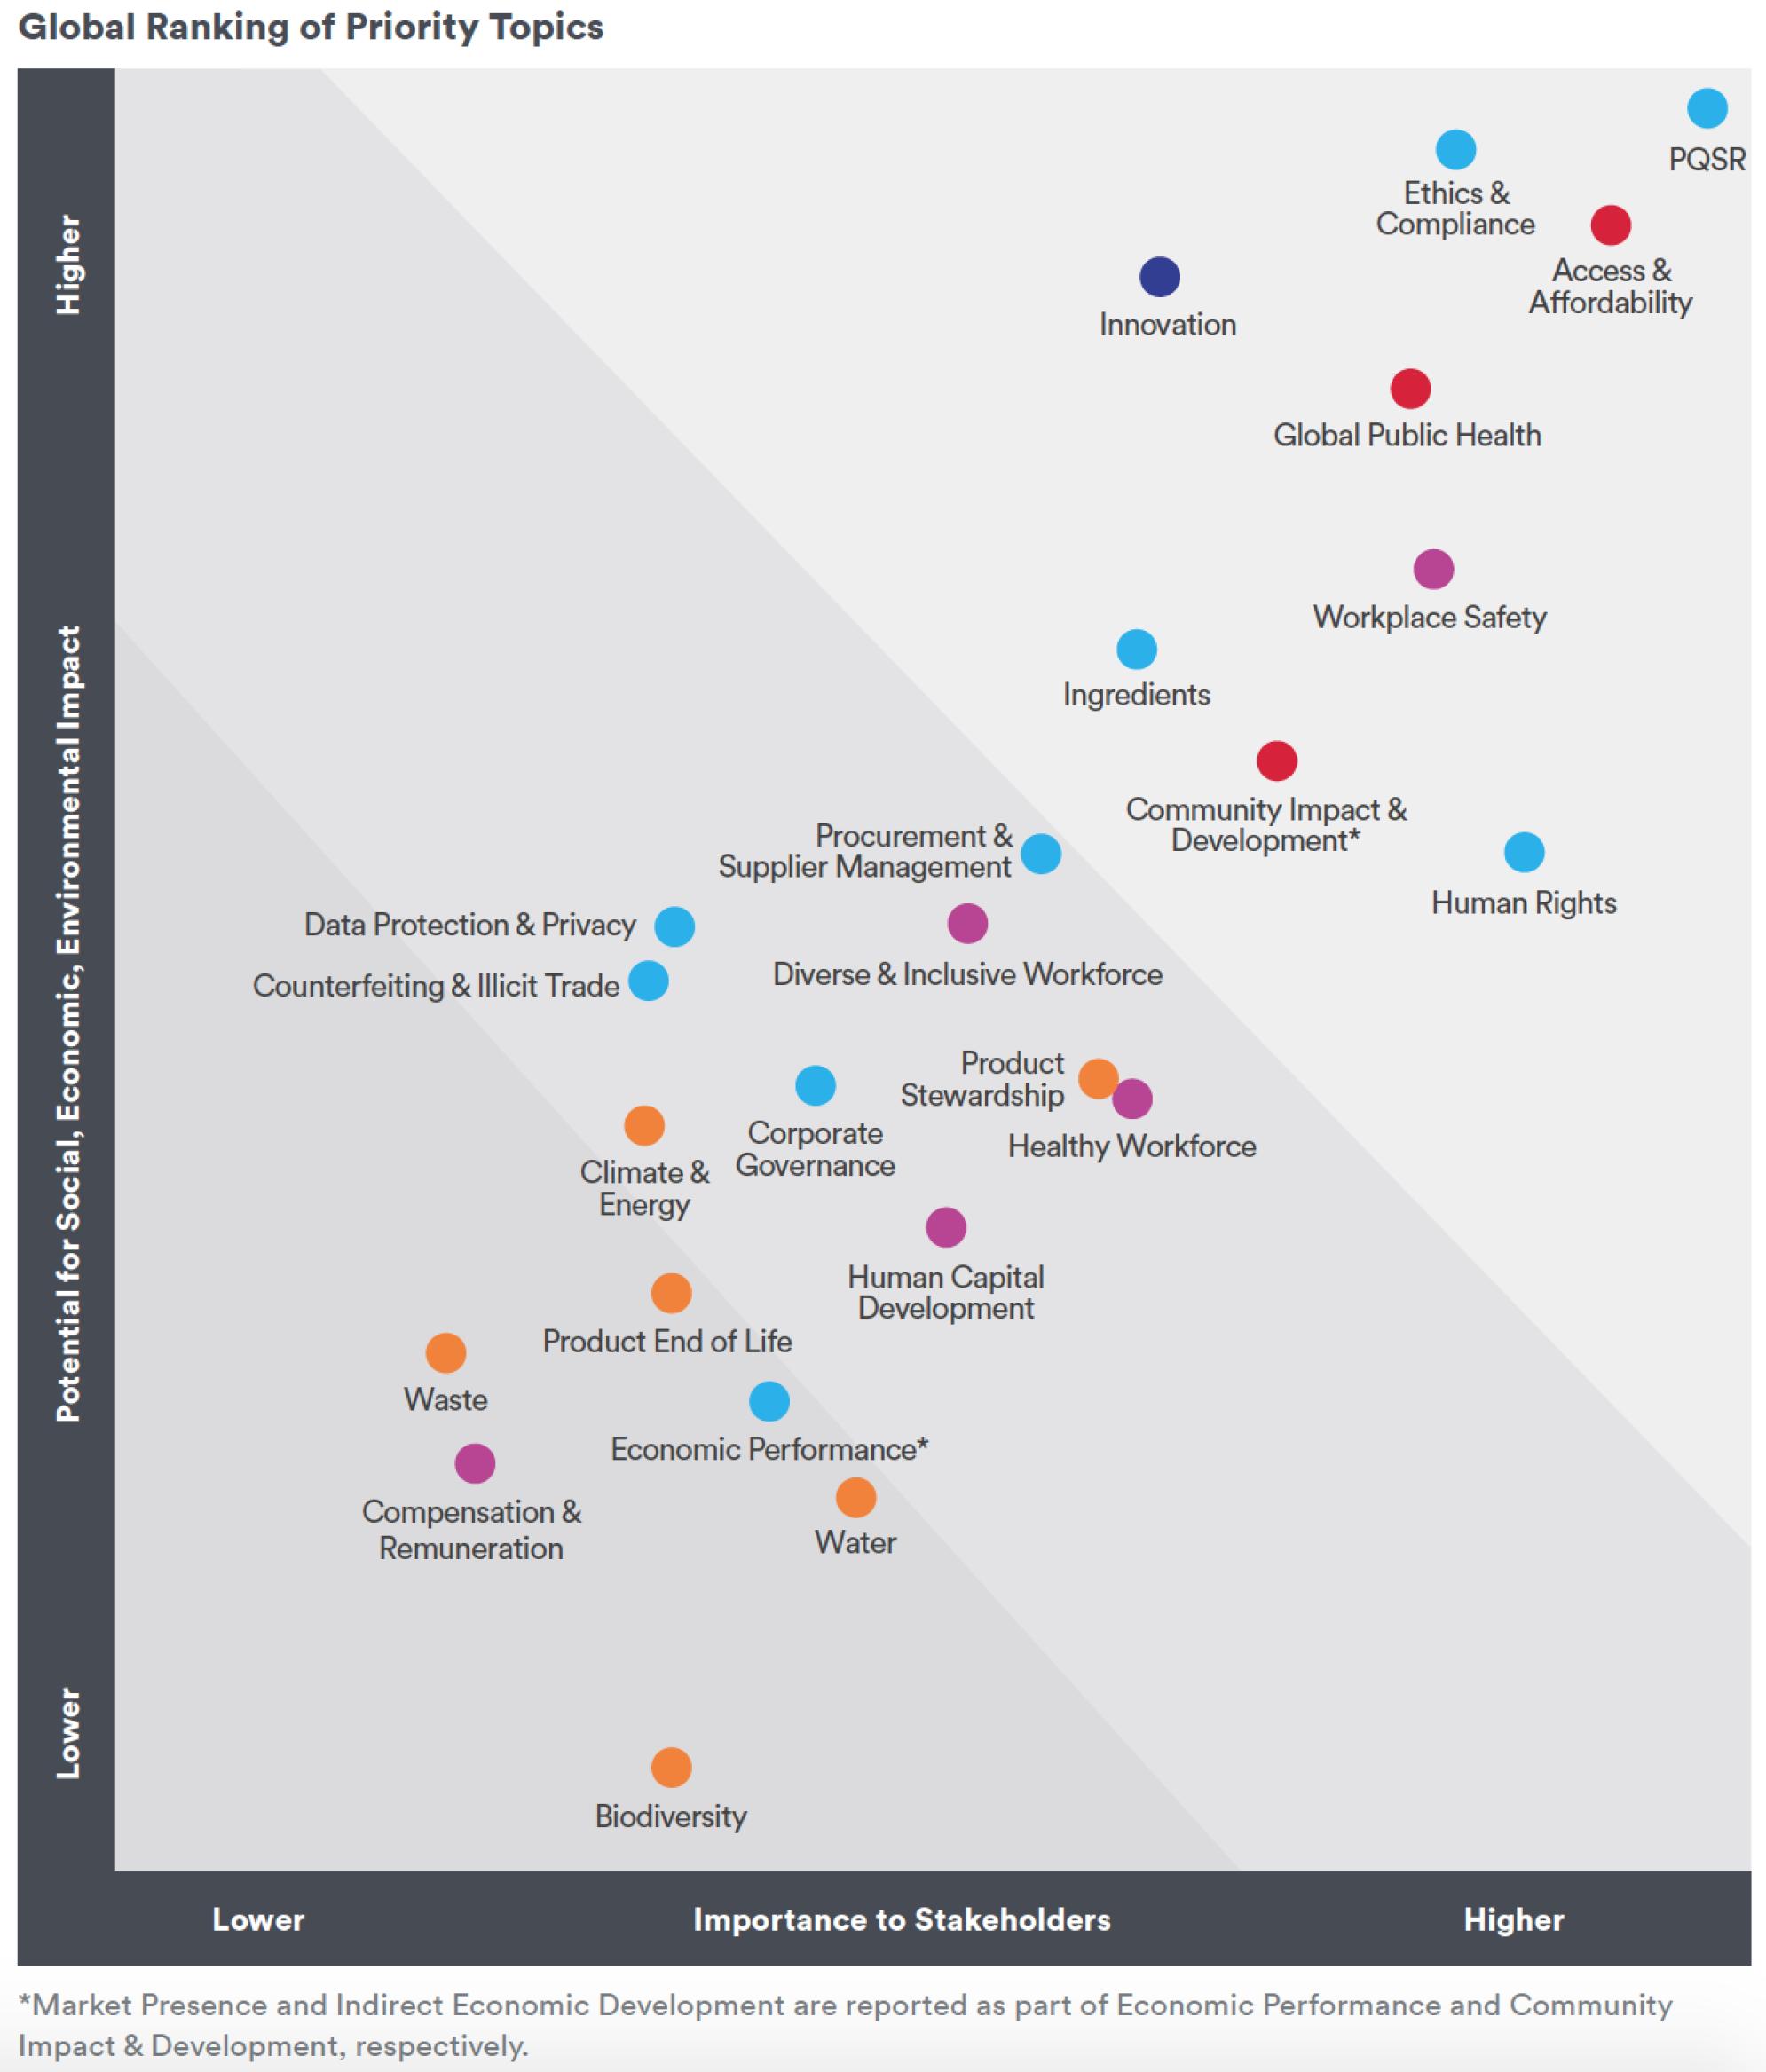 Global Ranking of Priority Topics